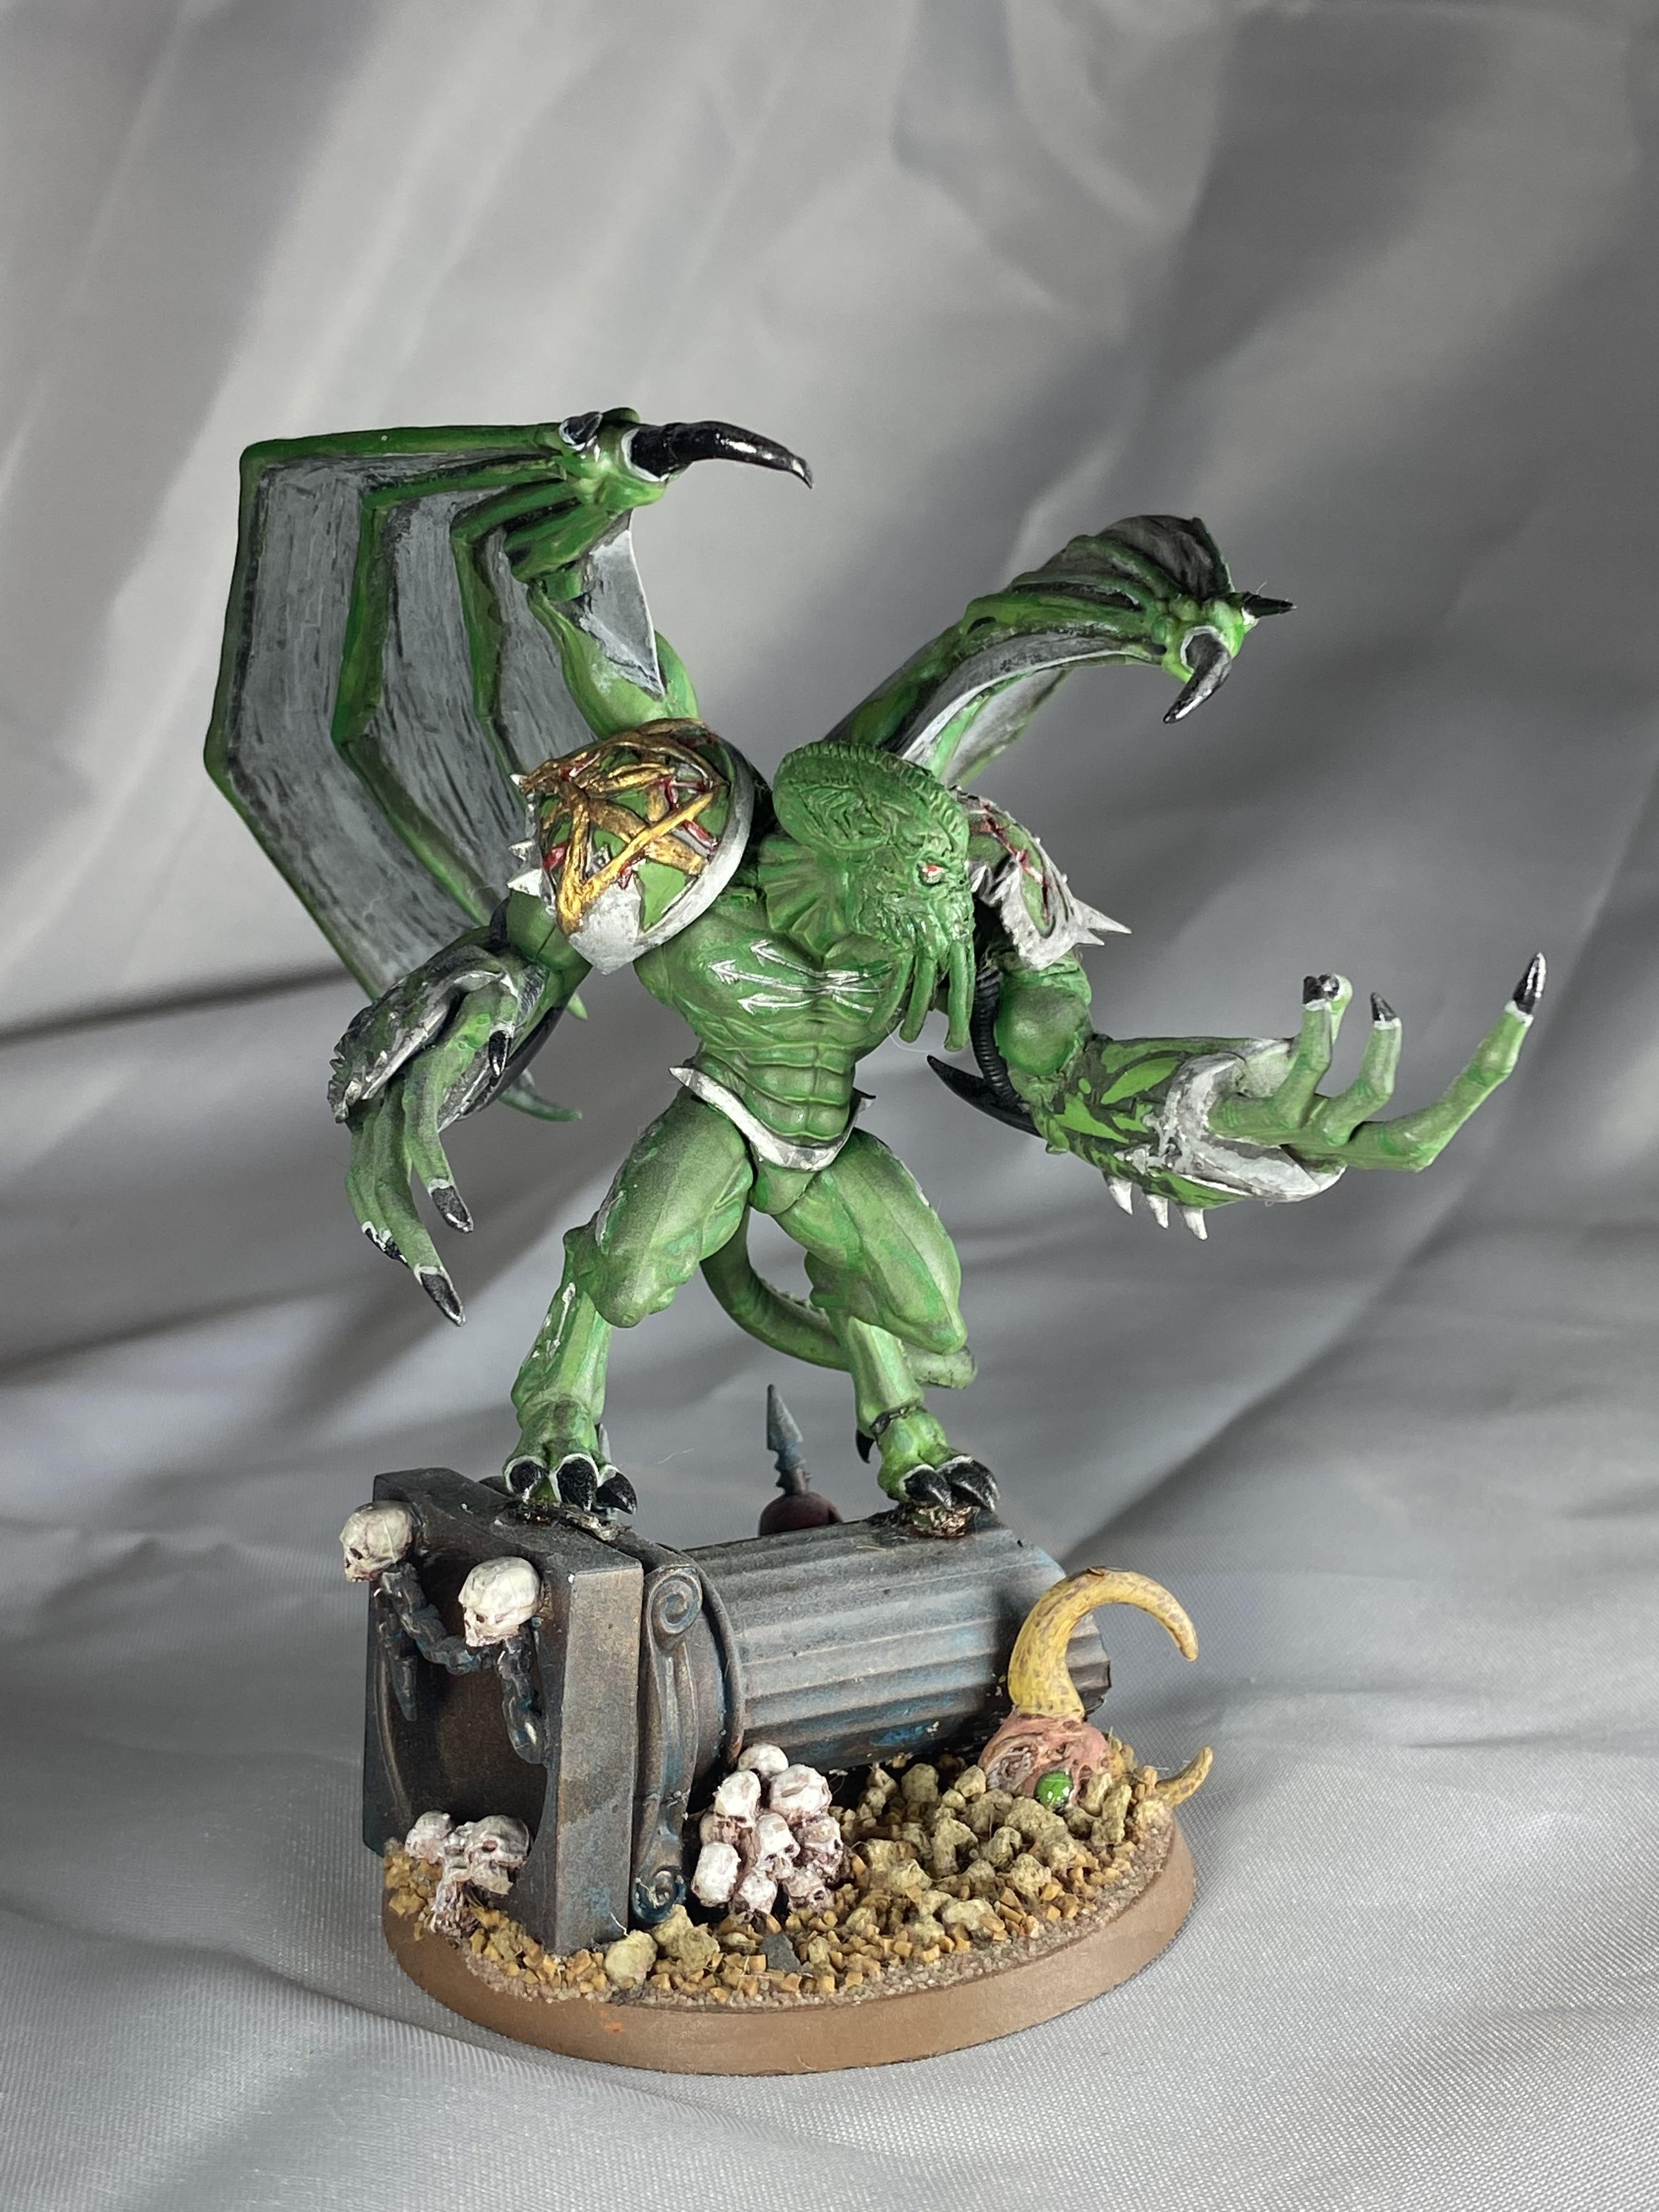 Chaos Space Marines, Cthulhu, Daemons, Death Guard, Green, Mythos, Nurgle, Prince, Warhammer 40,000